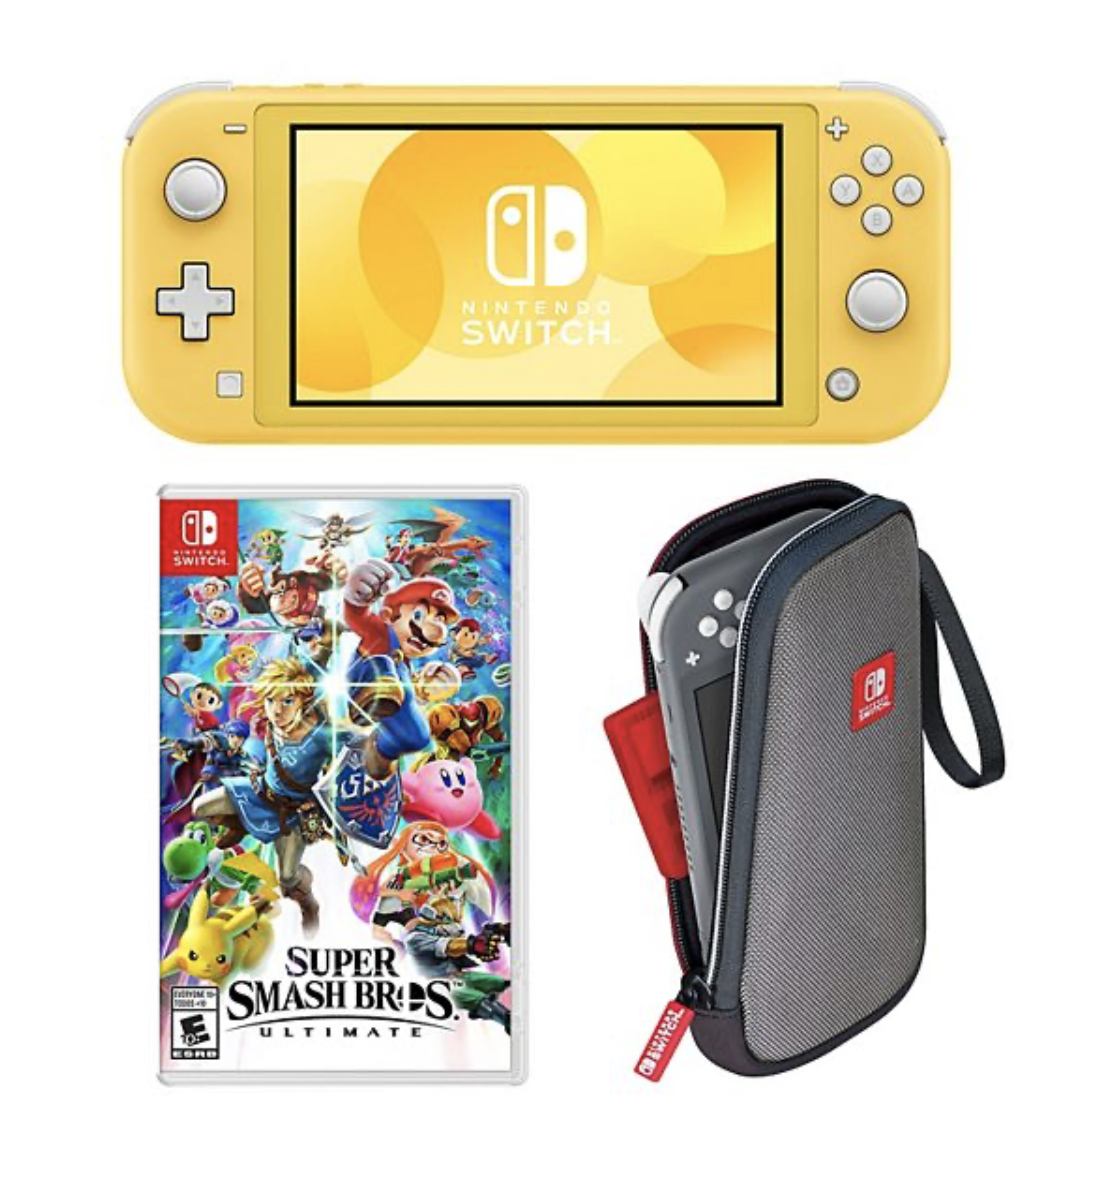 Nintendo With Lite Console & Super Smash Bros for 9.99